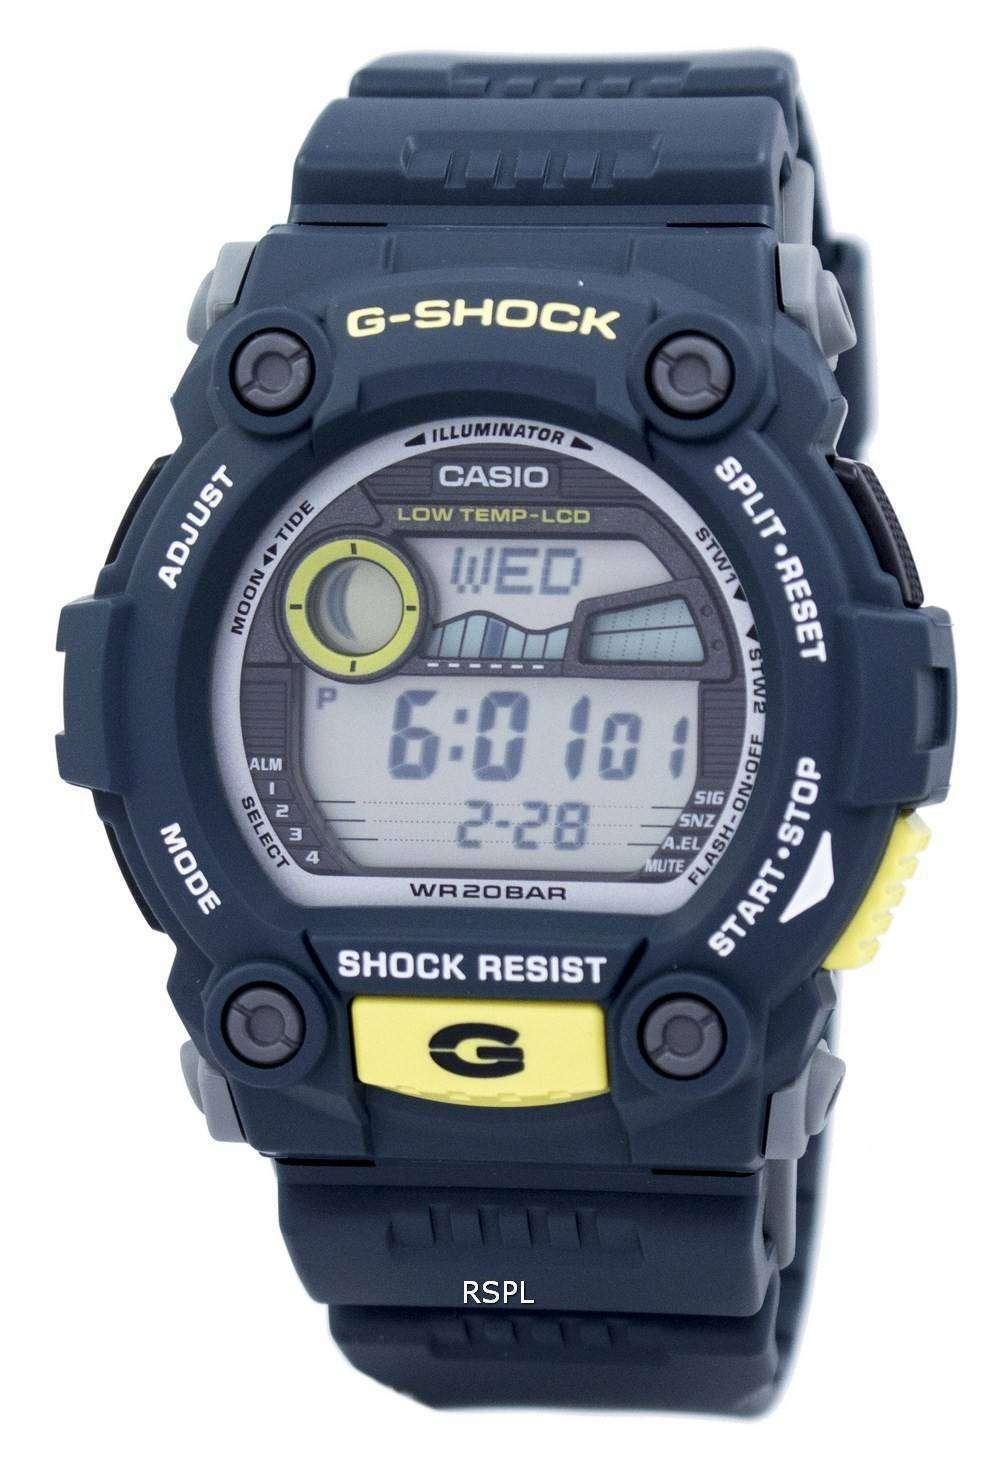 b2ece4e86720 Casio G-ShockA G-7900-2D Rescue Sport Mens Watch - CityWatches.co.uk